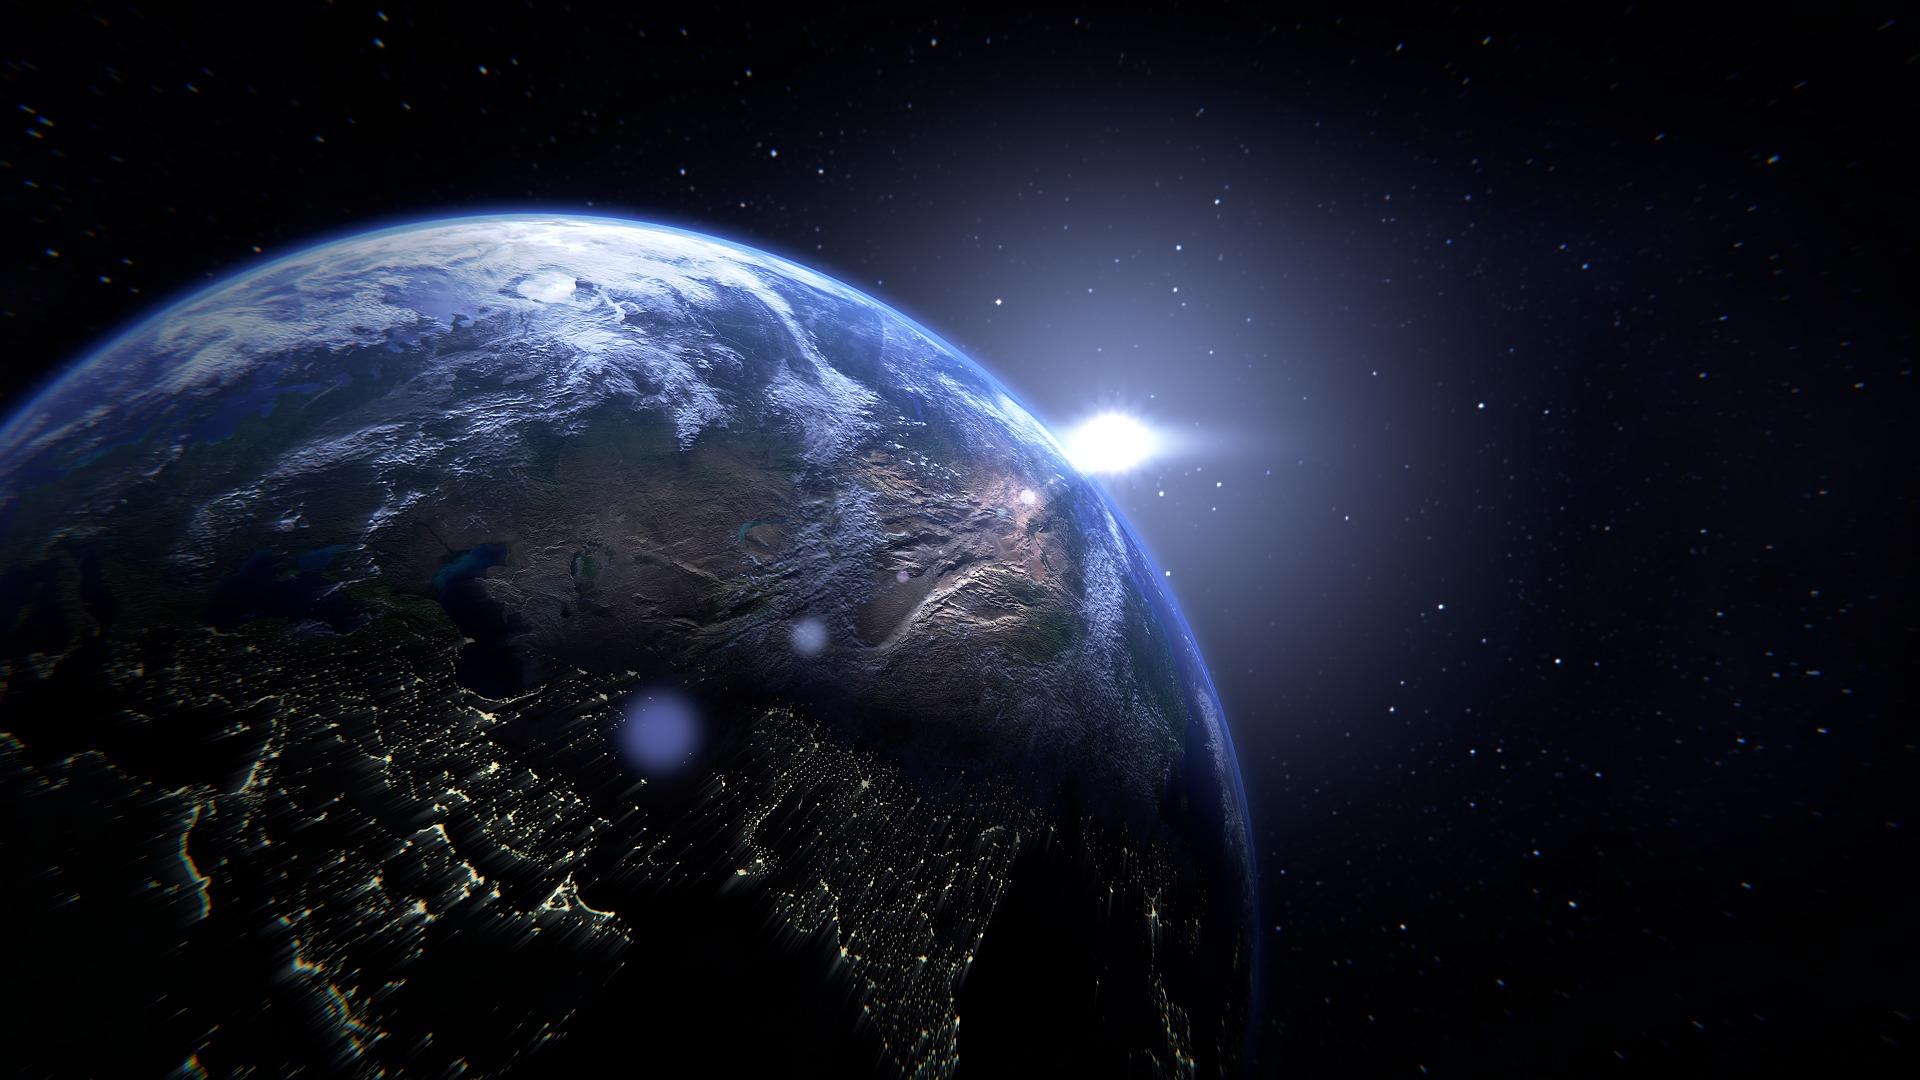 planet-1348079_1920.jpg